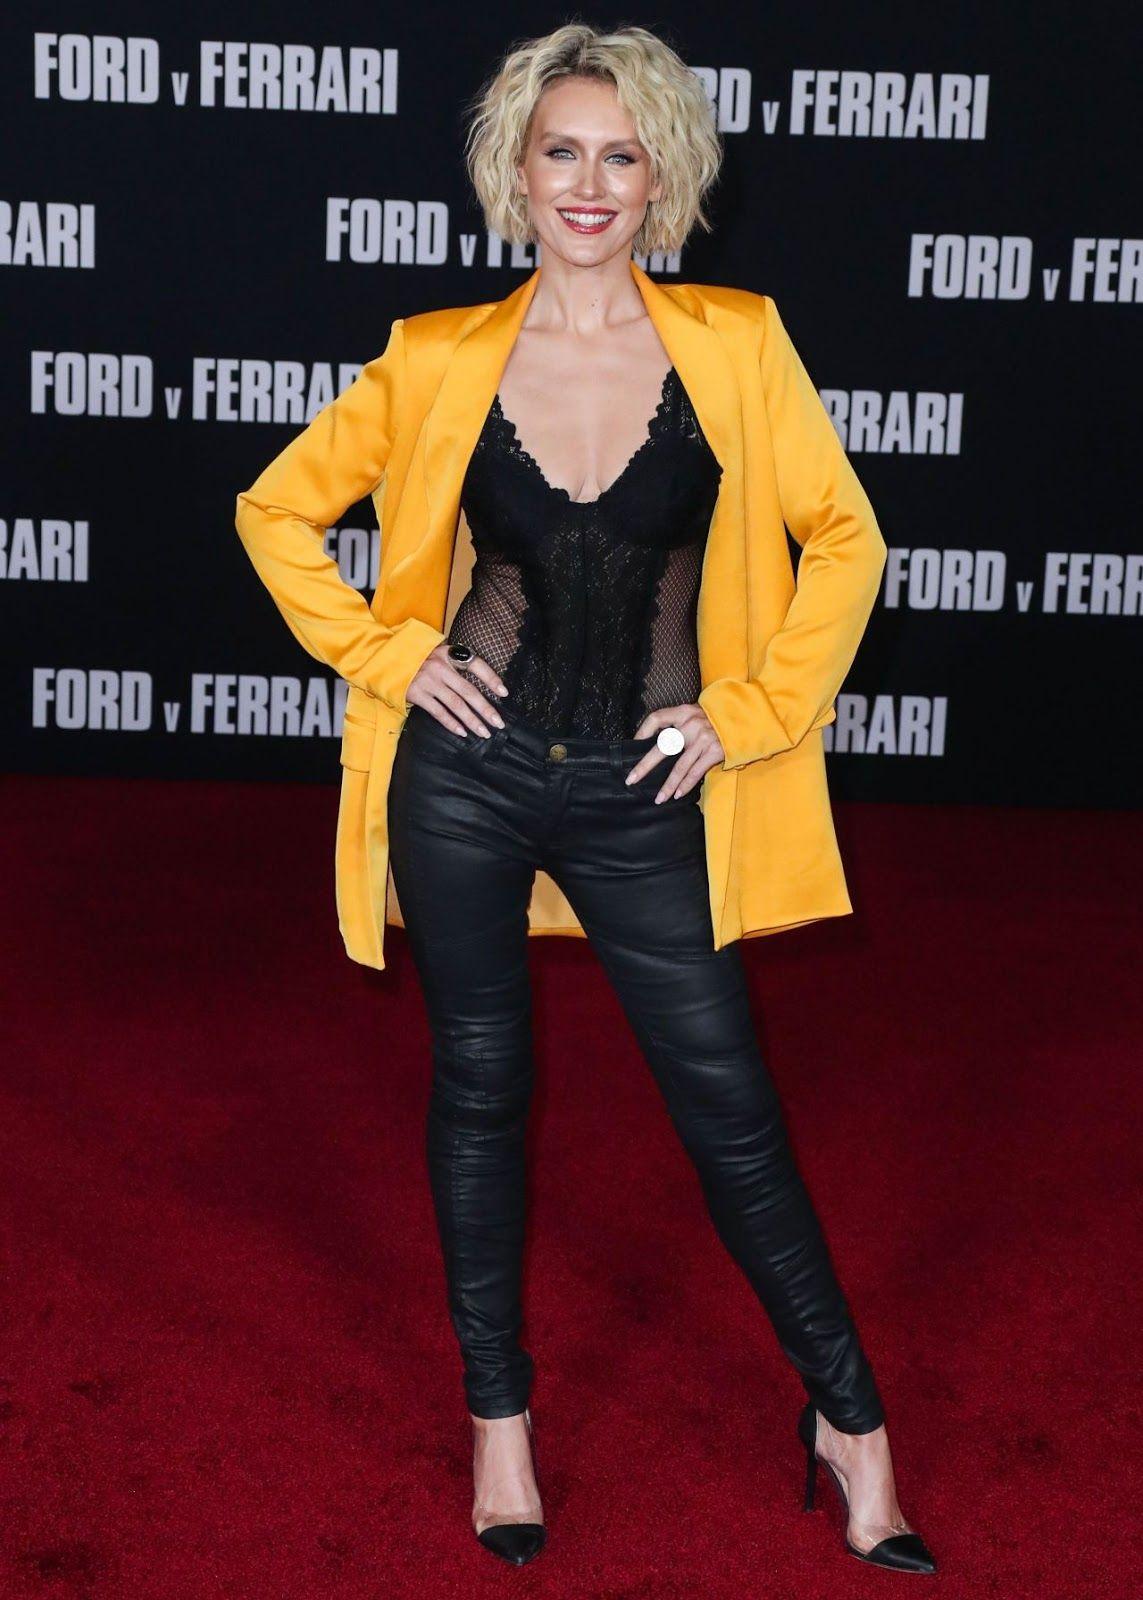 Nicky Whelan Ford V Ferrari Premiere In Hollywood Nicky Whelan Celebrities Female Premiere